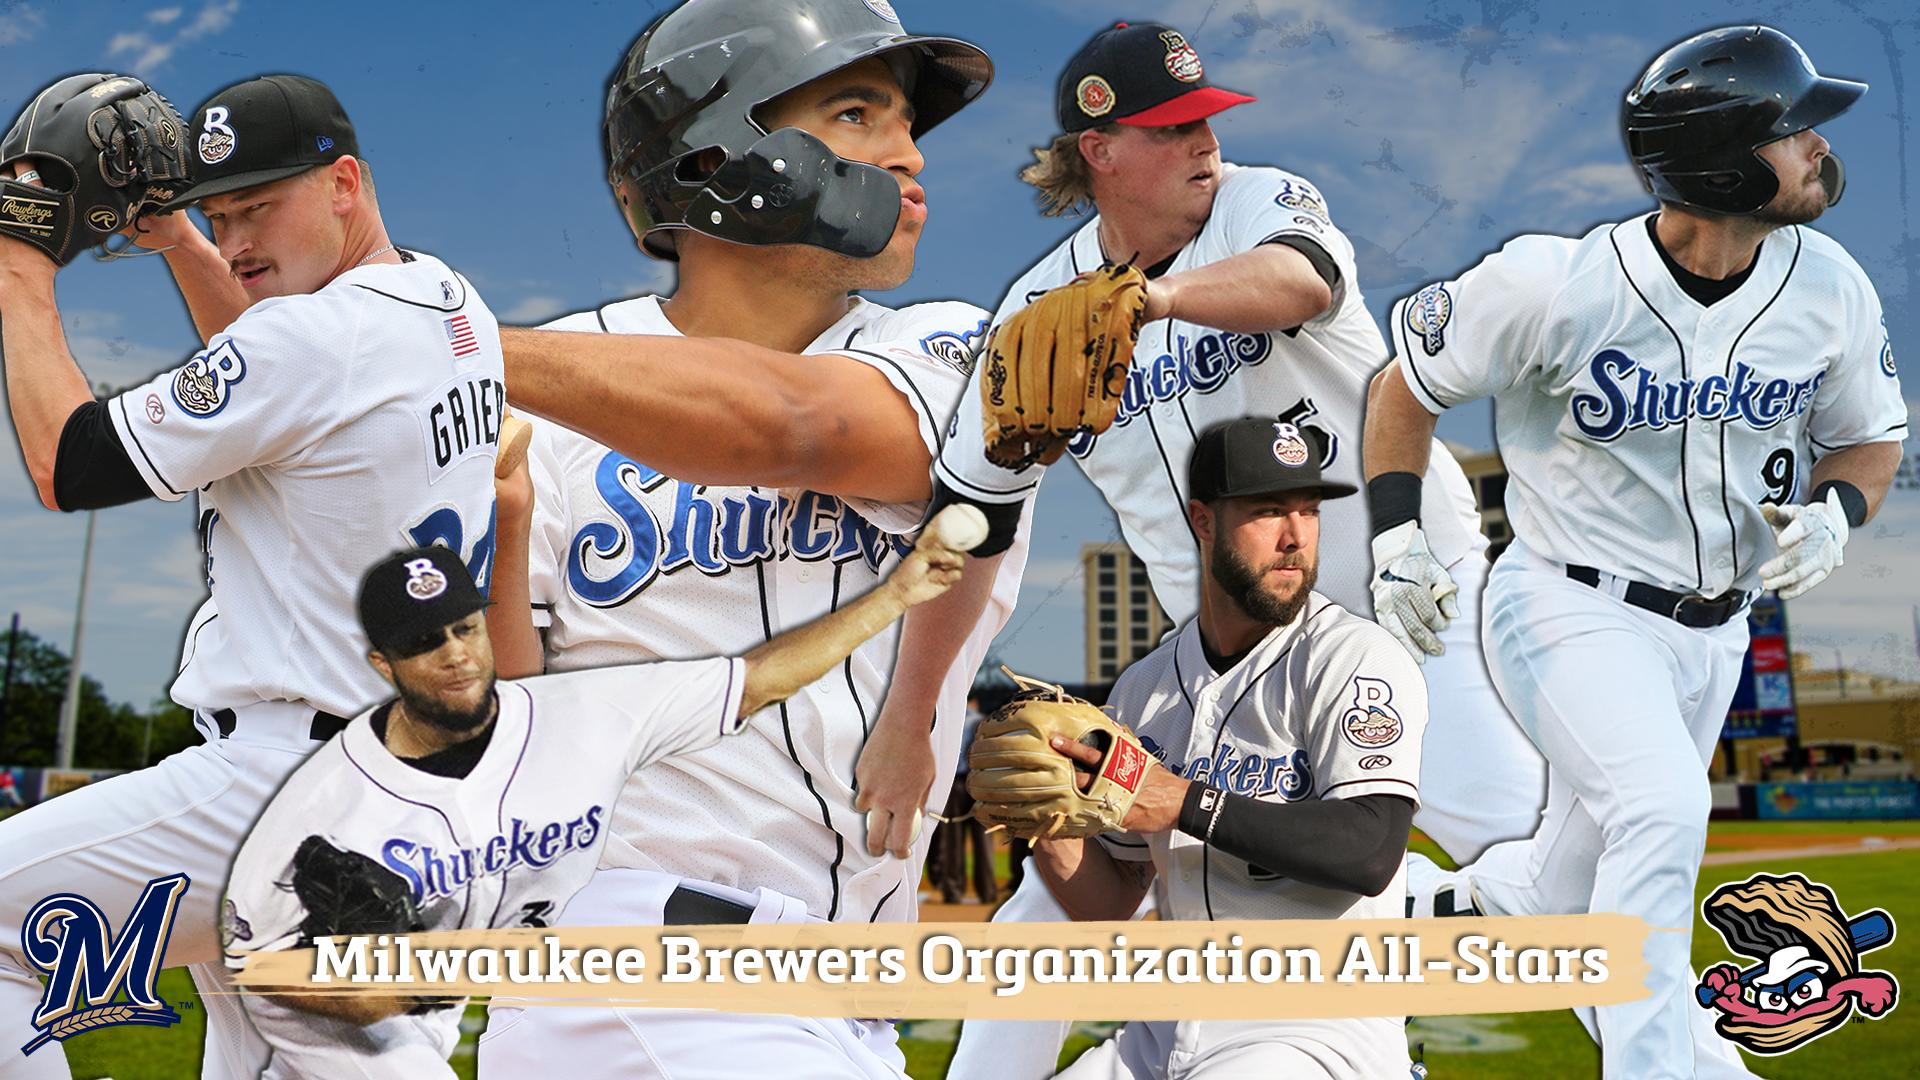 Shuckers 2019 Organizational all stars